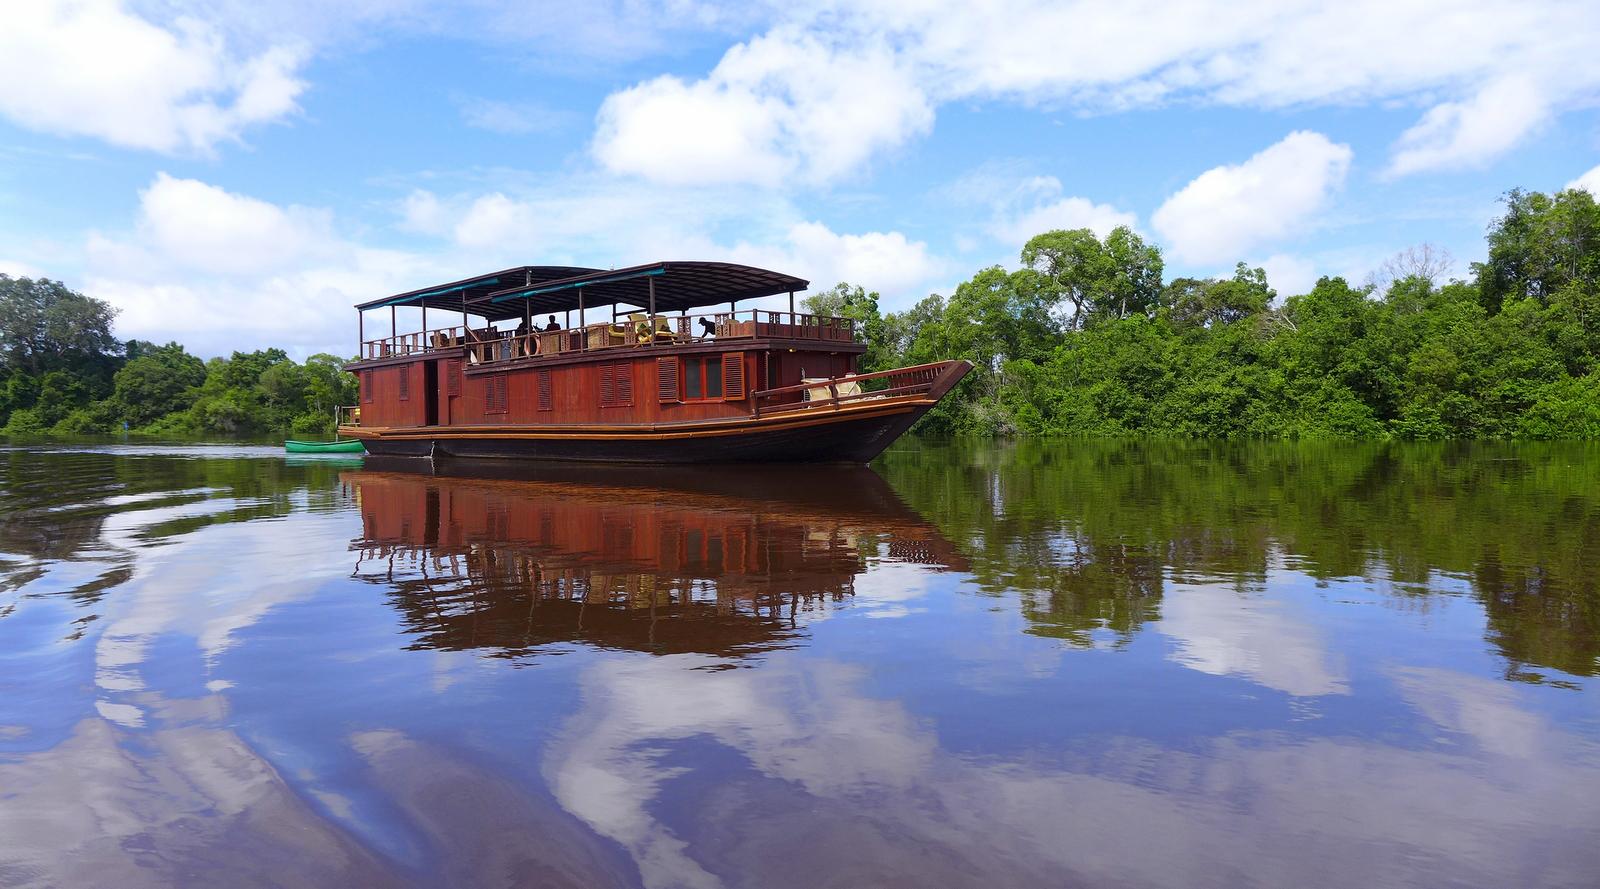 7 wisata indonesia mirip luar negeri sunagi di pulau kalimantan 7 wisata indonesia mirip luar negeri